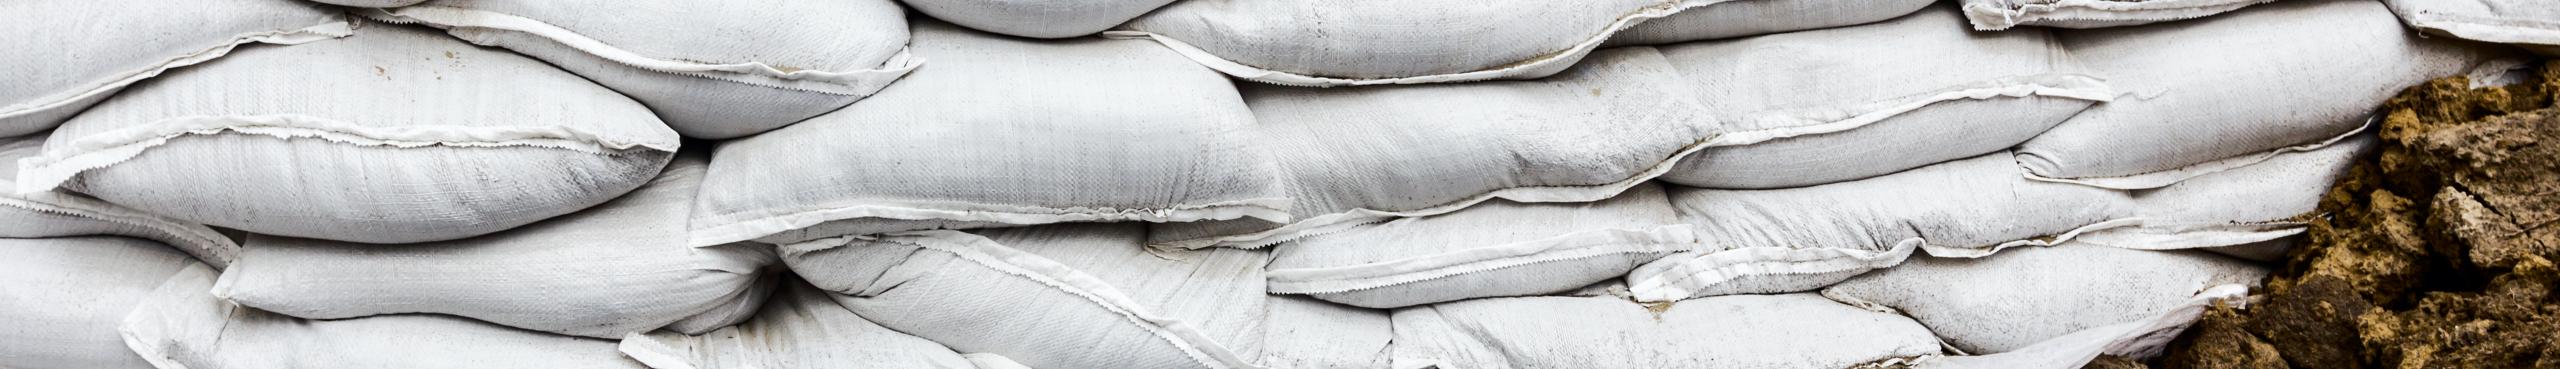 Extrusion Coated & Uncoated Tube Sandbags